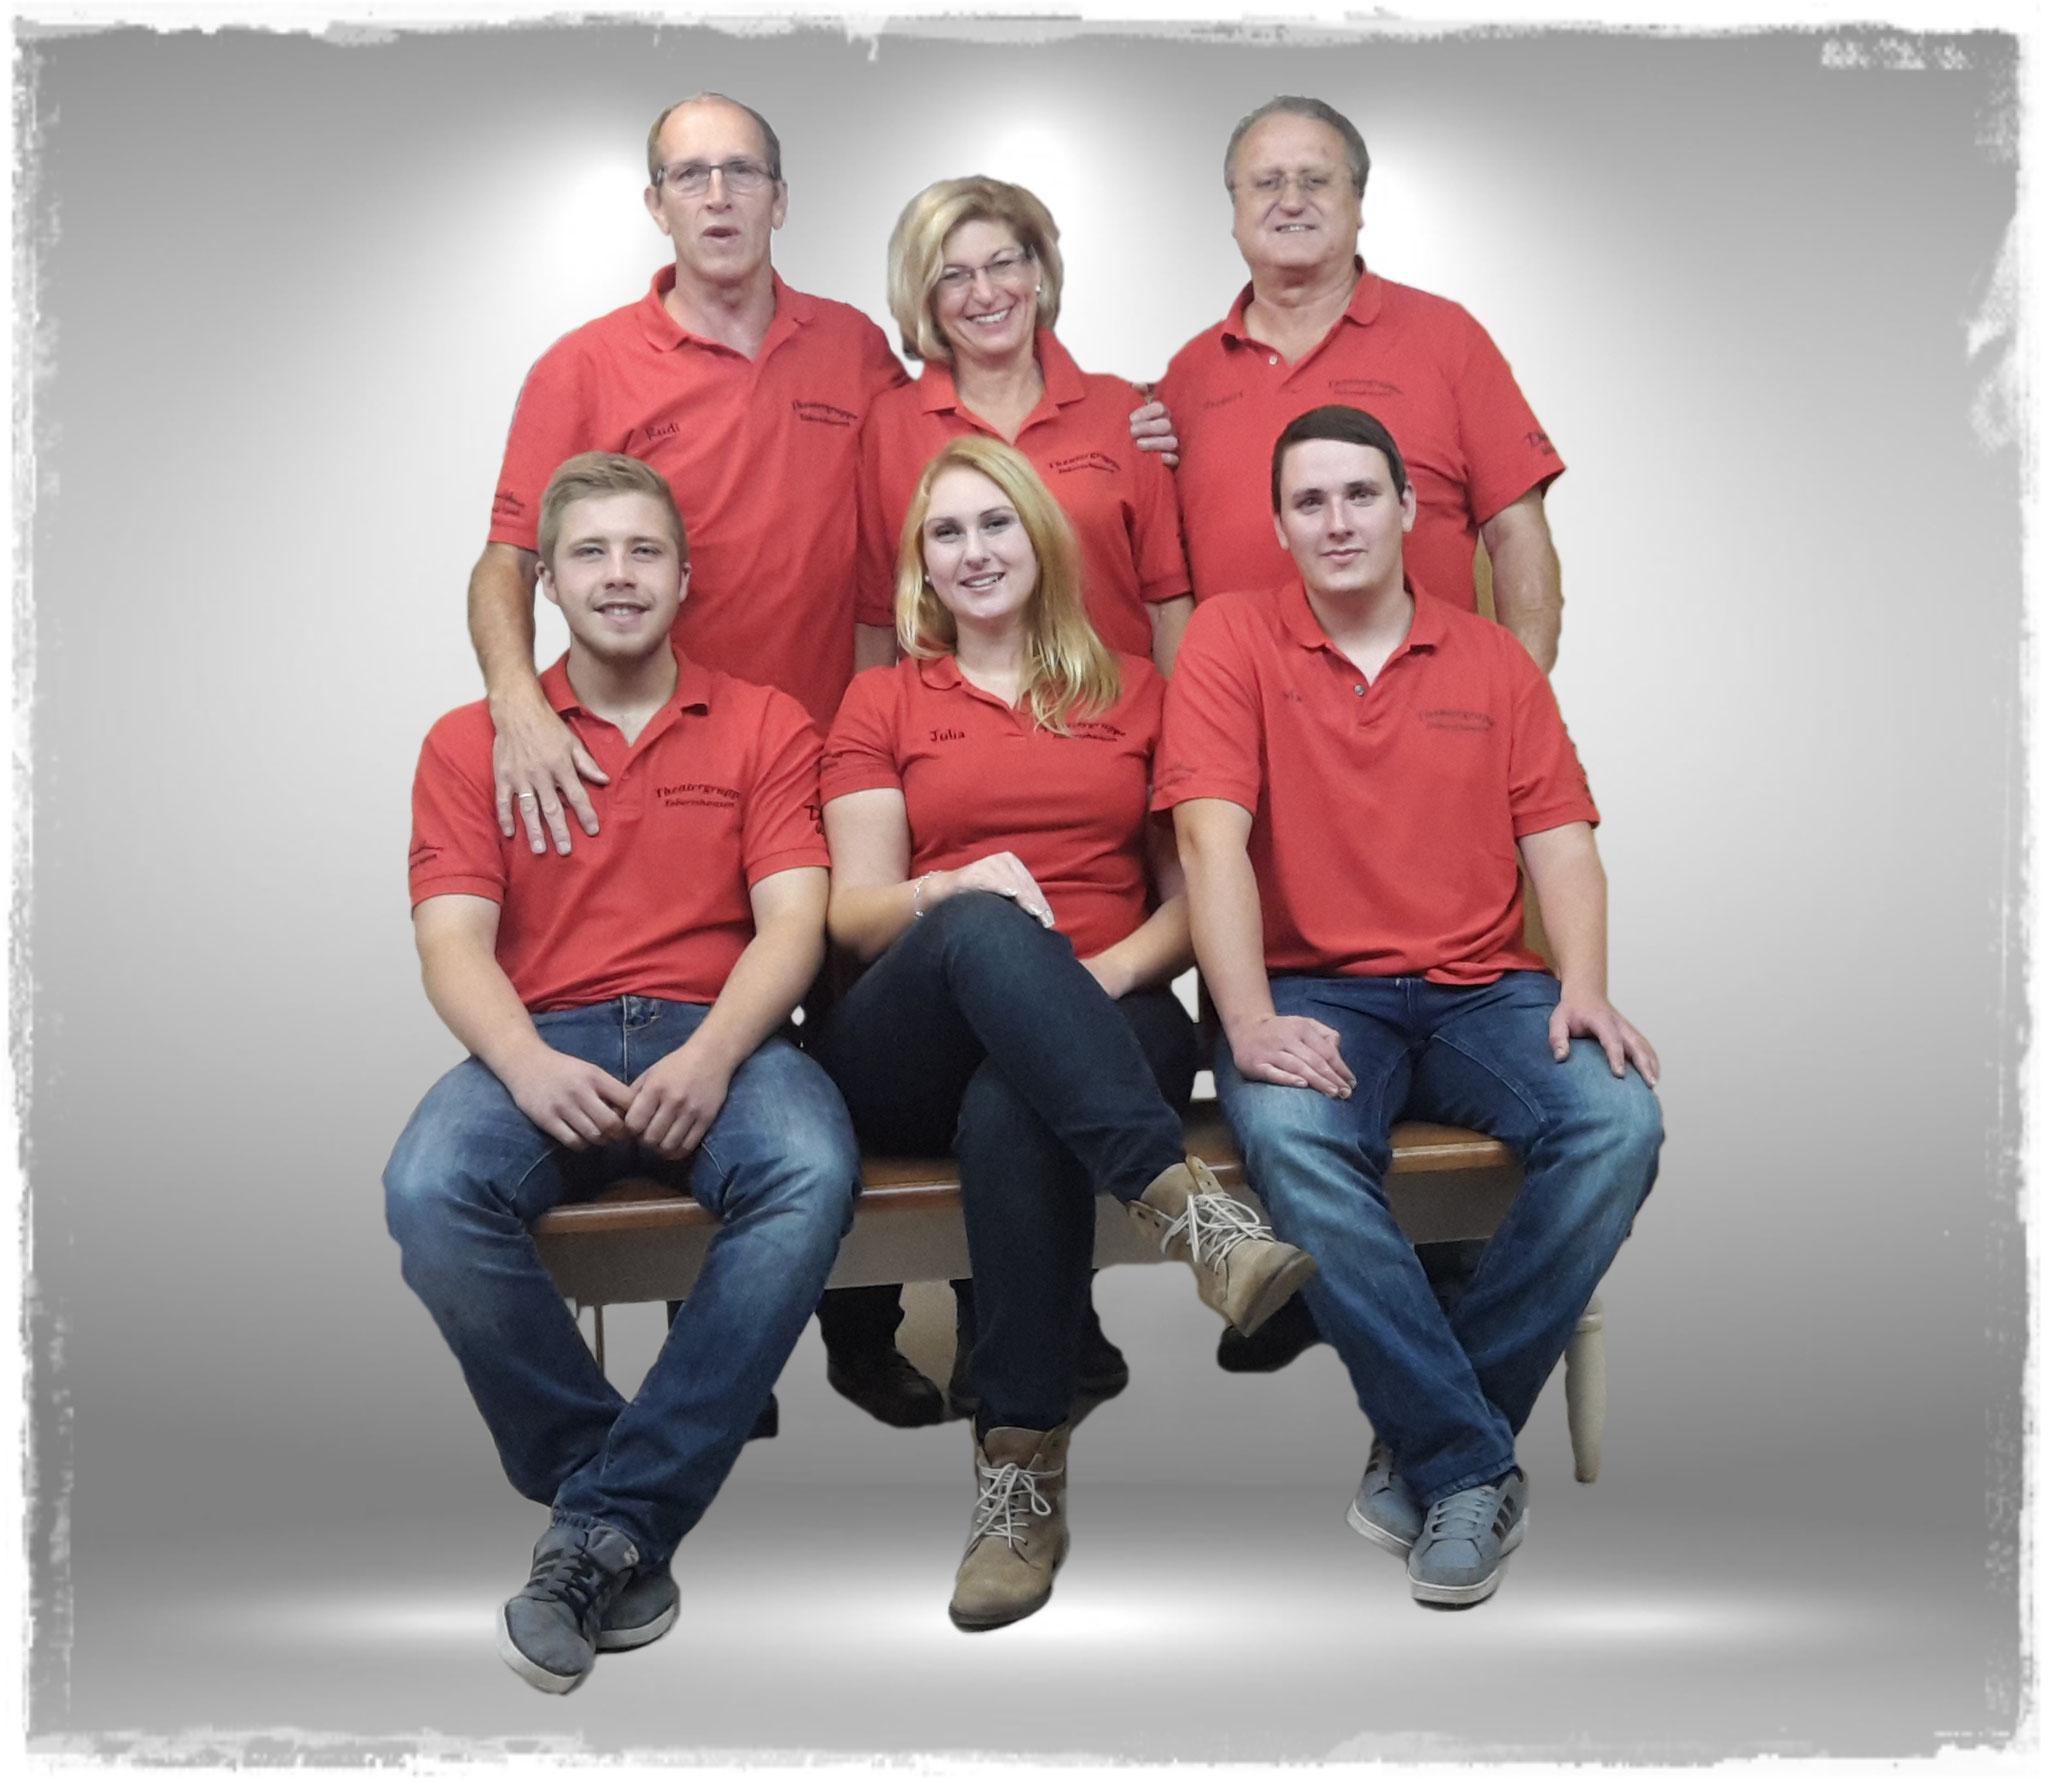 Vorne: Hansi Stoiber, Julia Fleischmann, Manuel Weber. Hinten: Rudi Köck, Lilly Seis, Herbert Gerl